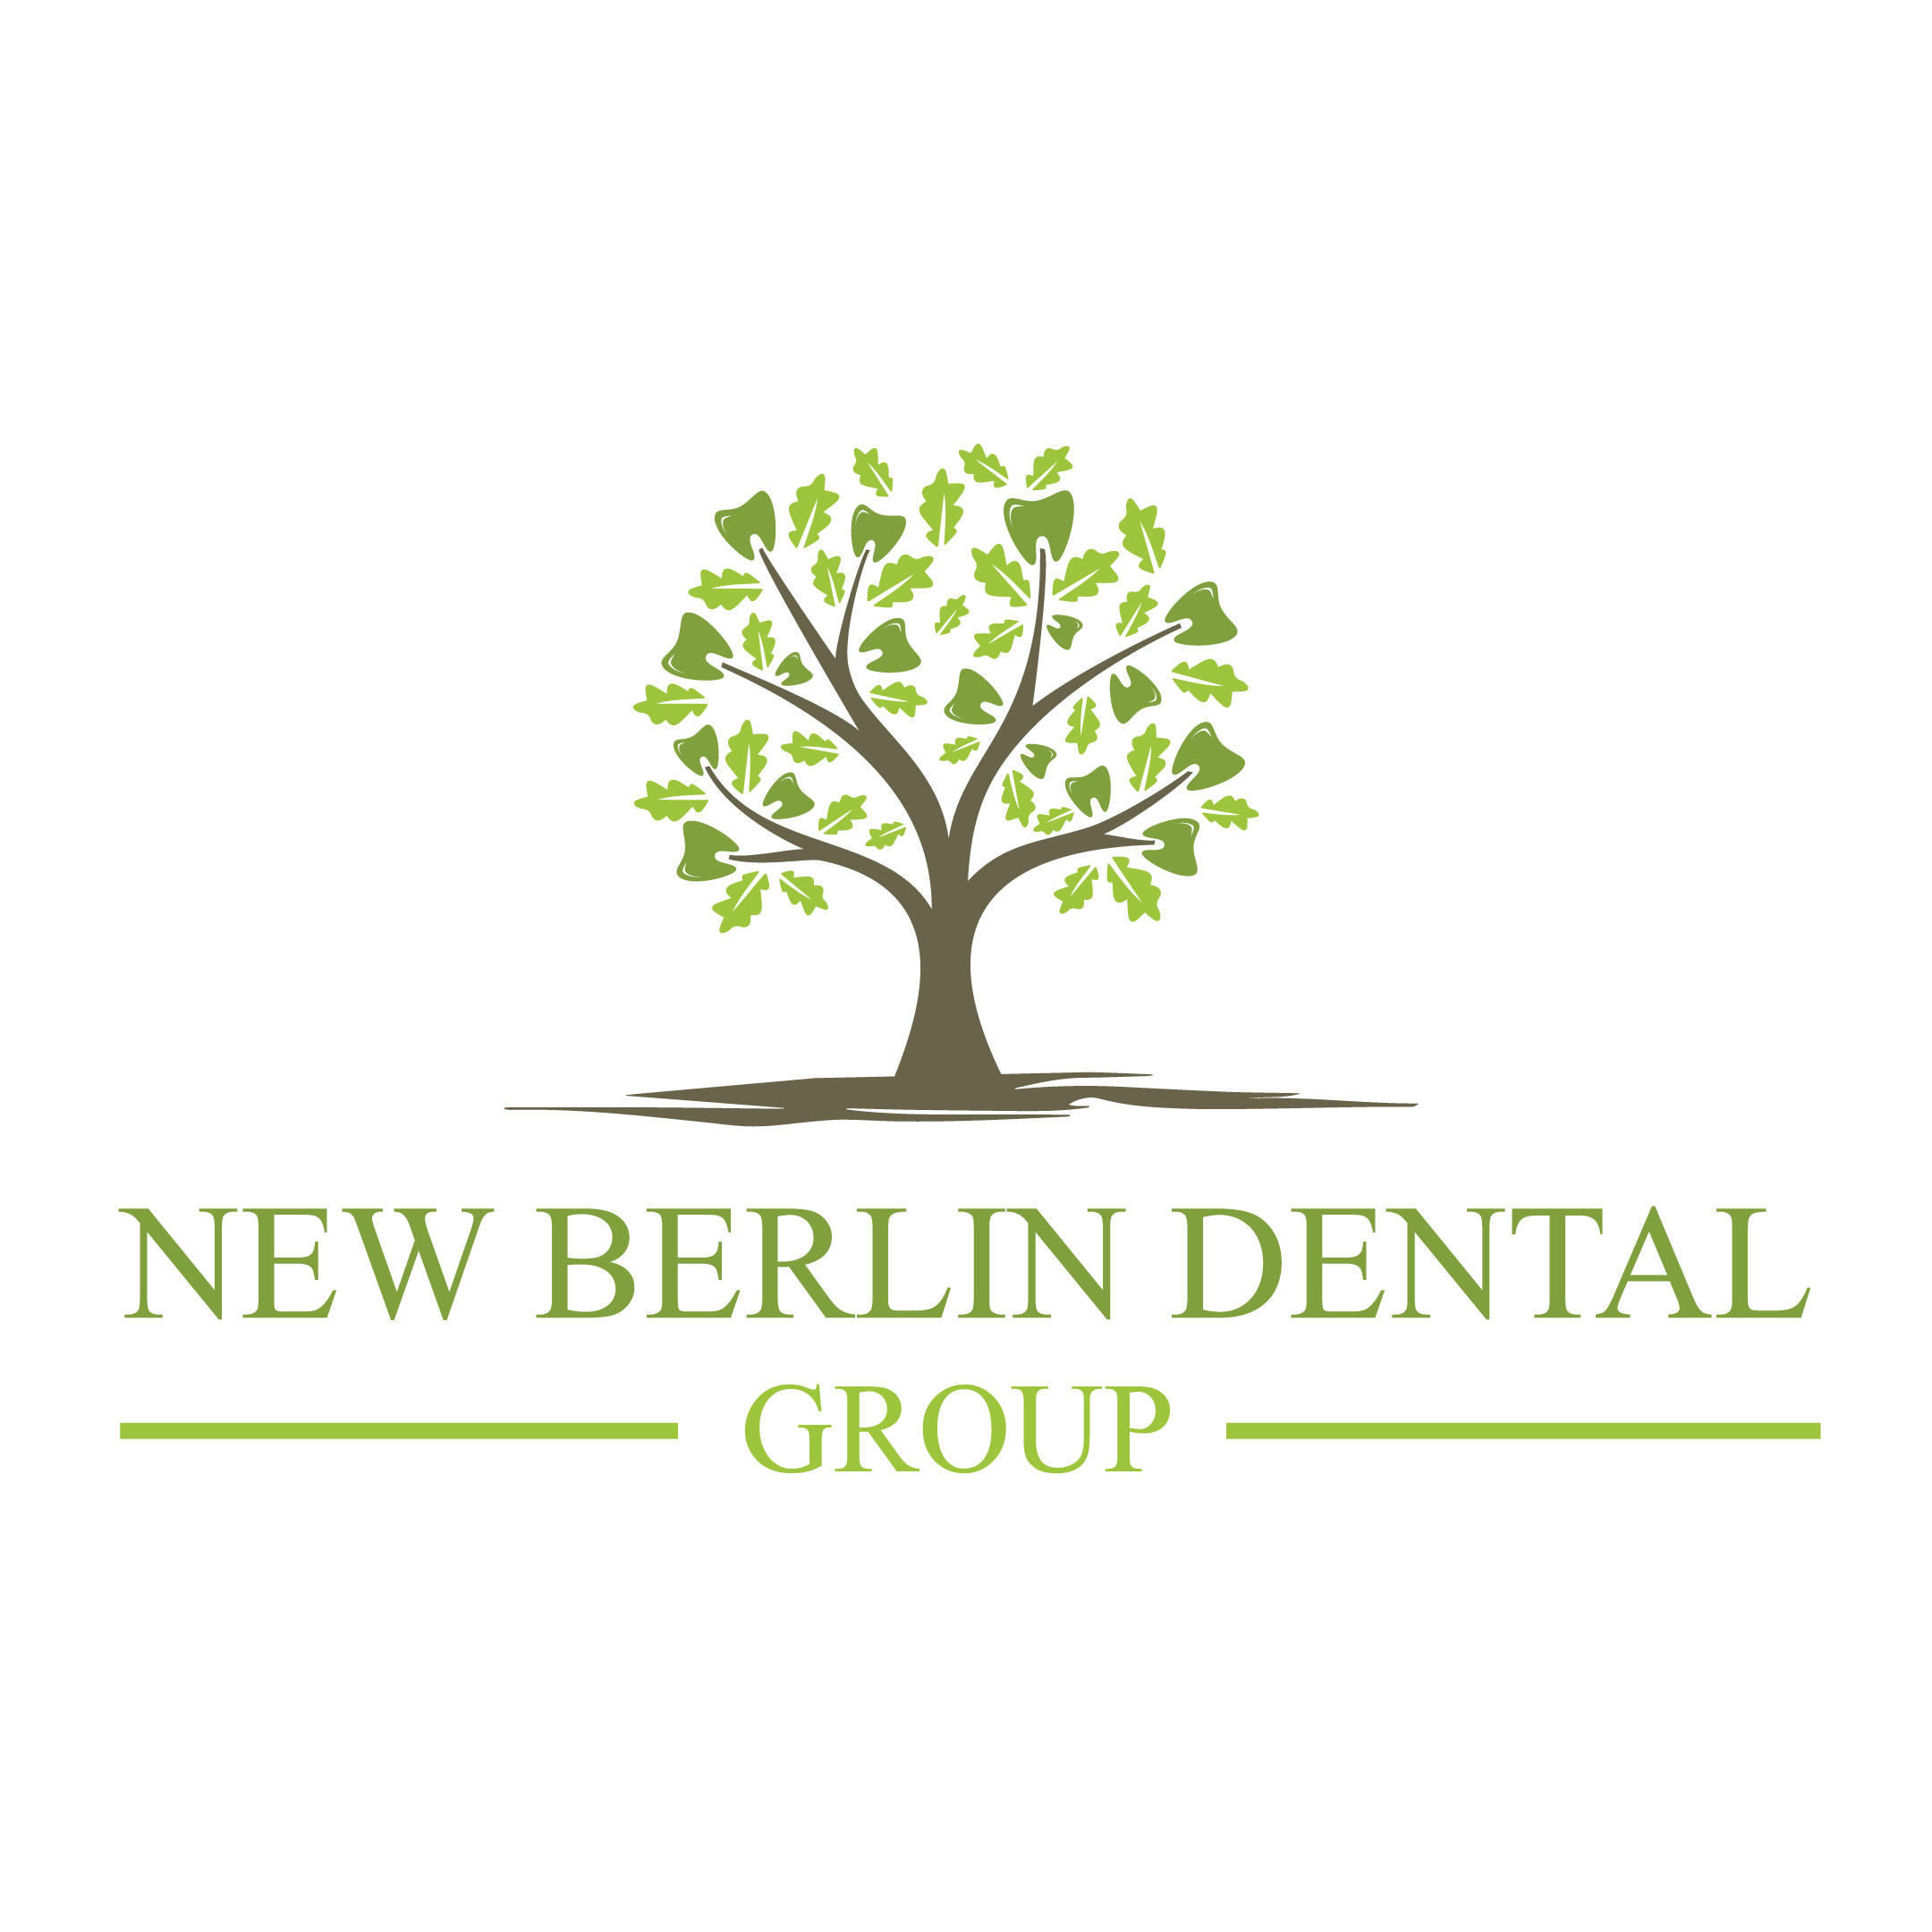 New Berlin Dental Group - New Berlin, WI - Dentists & Dental Services